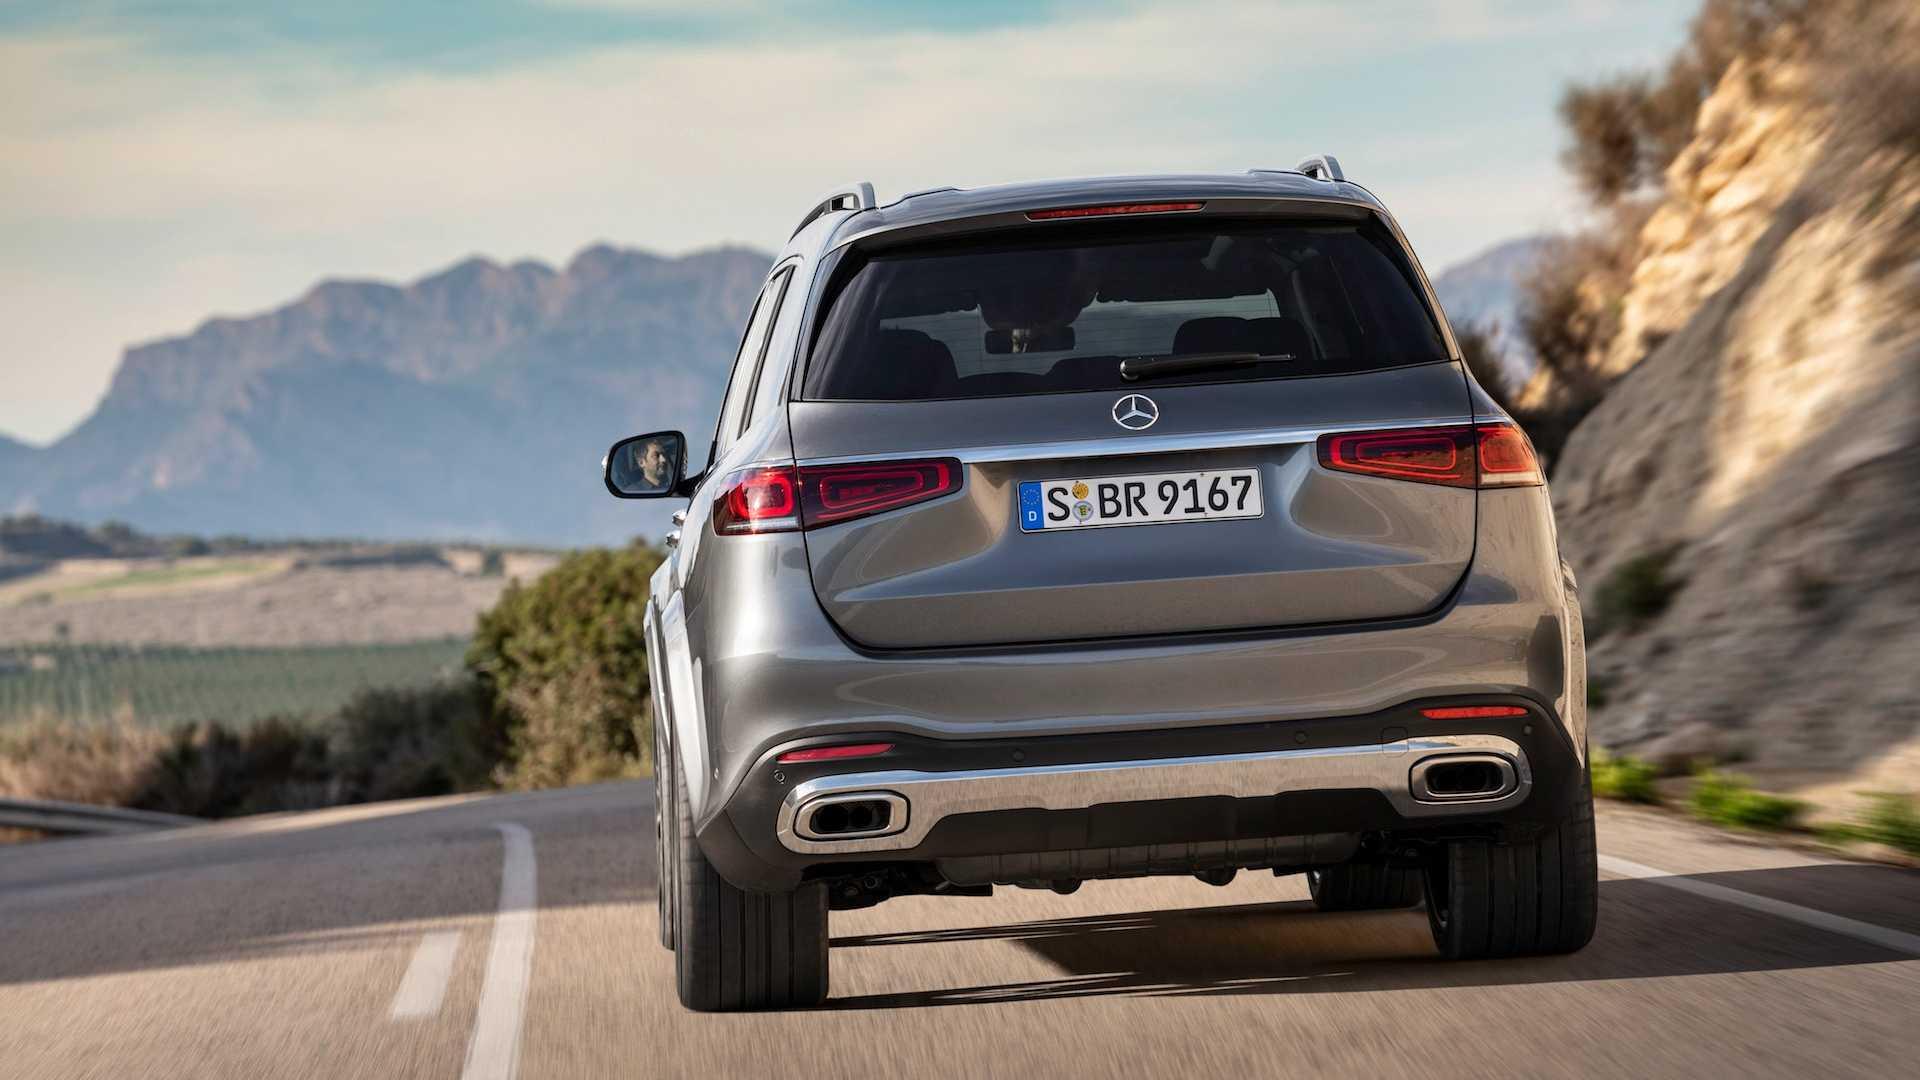 2020 Mercedes-Benz GLS AMG Line (Color: Designo Selenite Grey Metallic) Rear Wallpapers (8)